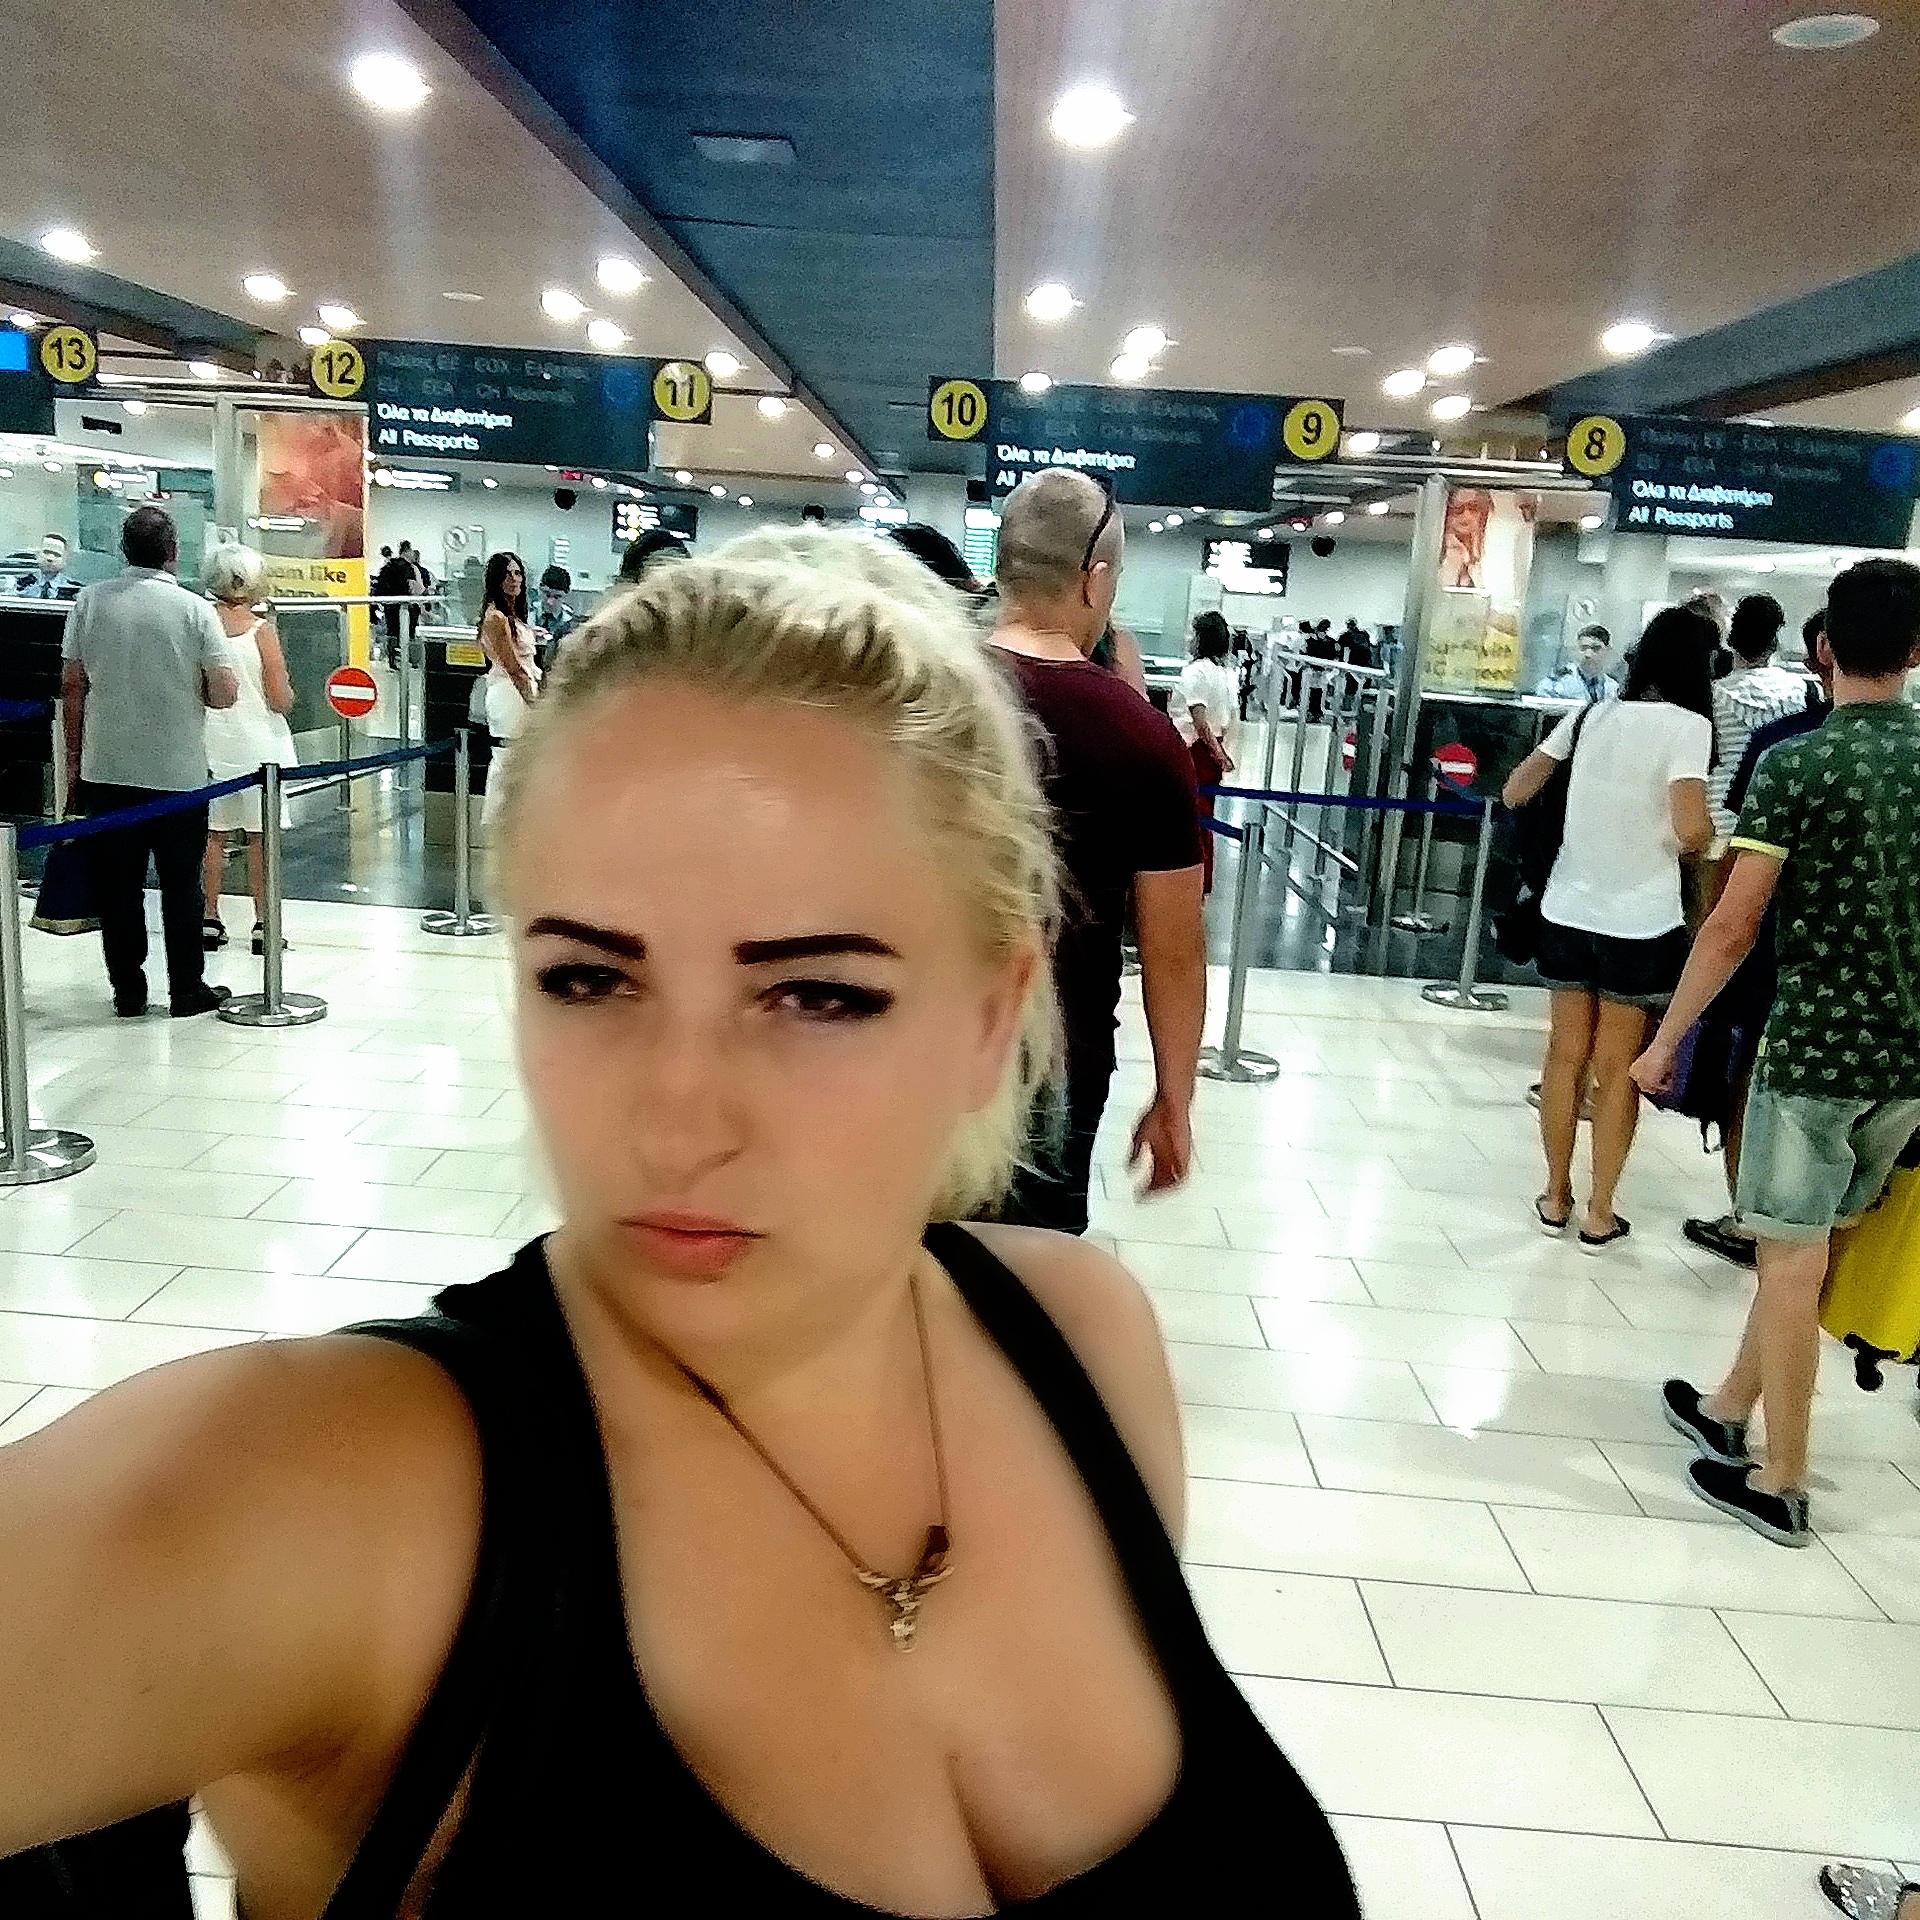 Елена Руденко (Валтея). Кипр. Айия-Напа (фото). VtShG-vZ220